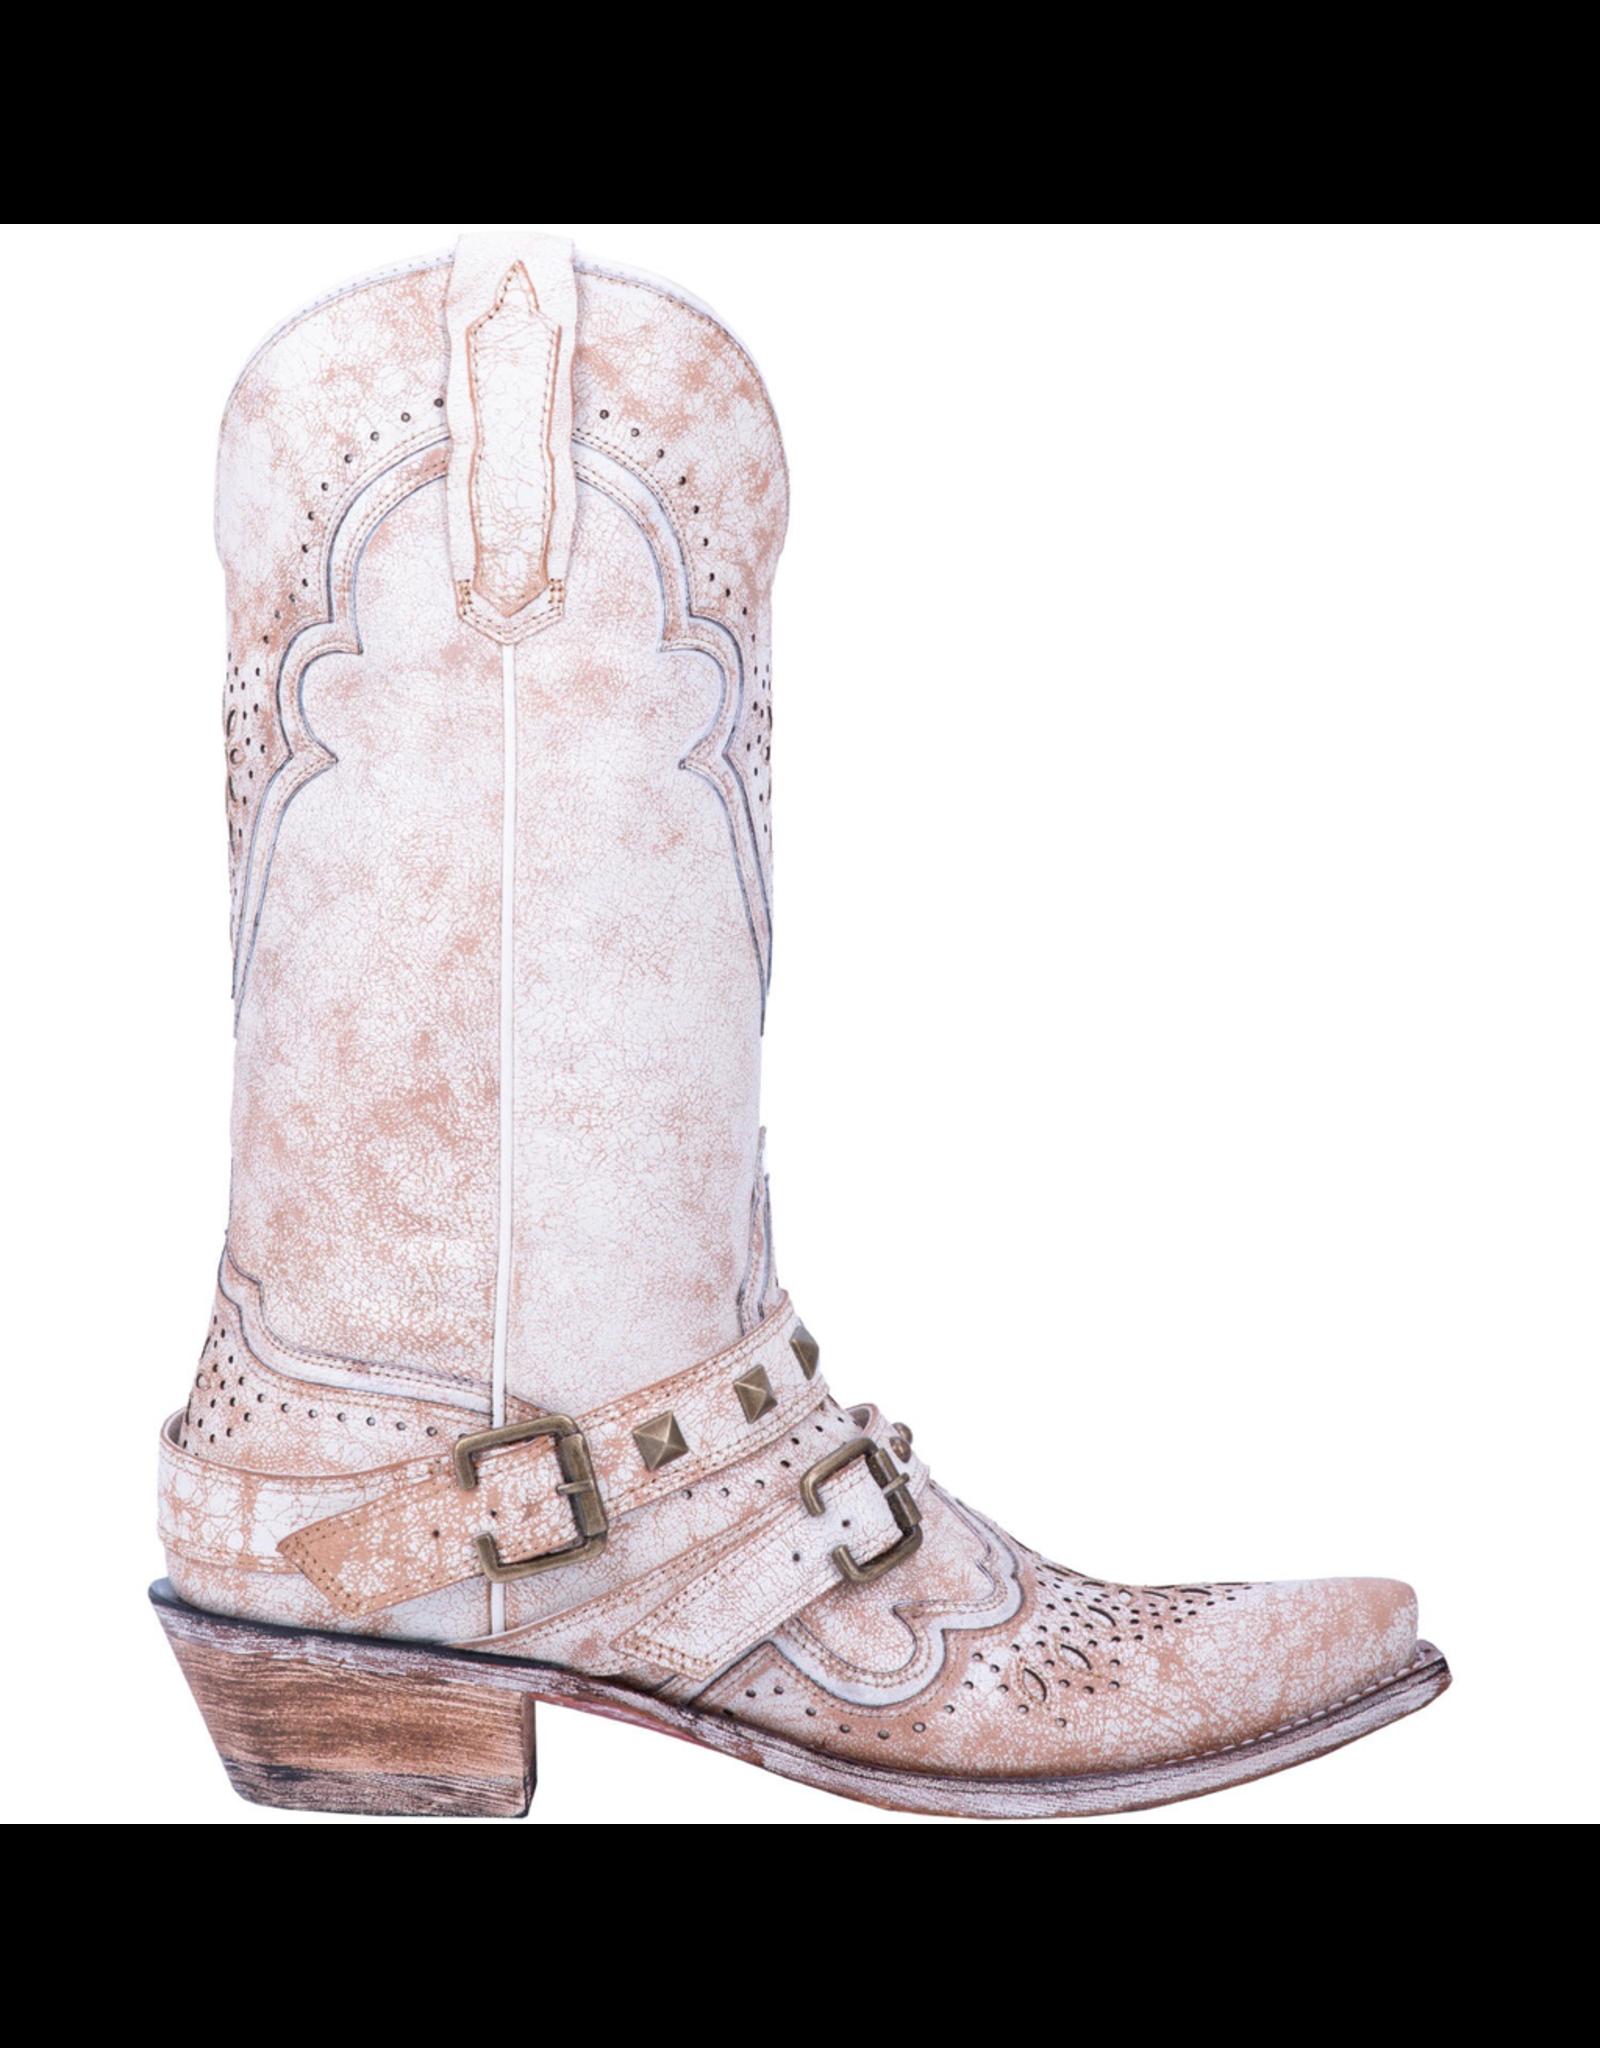 Boots-Women Dan Post DP4063<br /> RESTLESS LEATHER BOOT